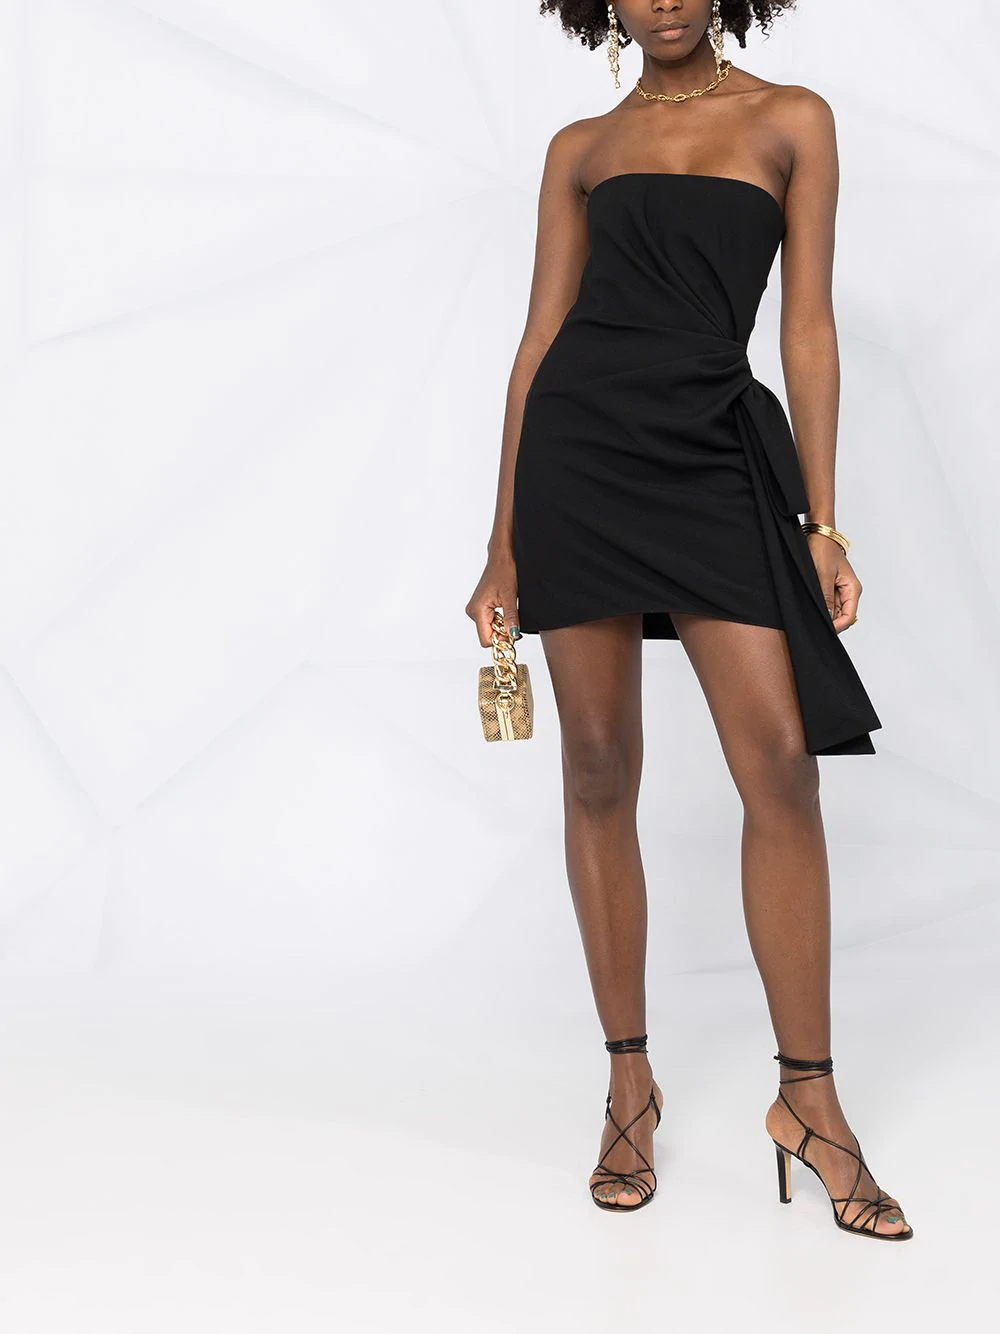 Saint Laurent Side Tie Strapless Dress Farfetch In 2021 Strapless Dress Dresses Strapless [ 1334 x 1000 Pixel ]